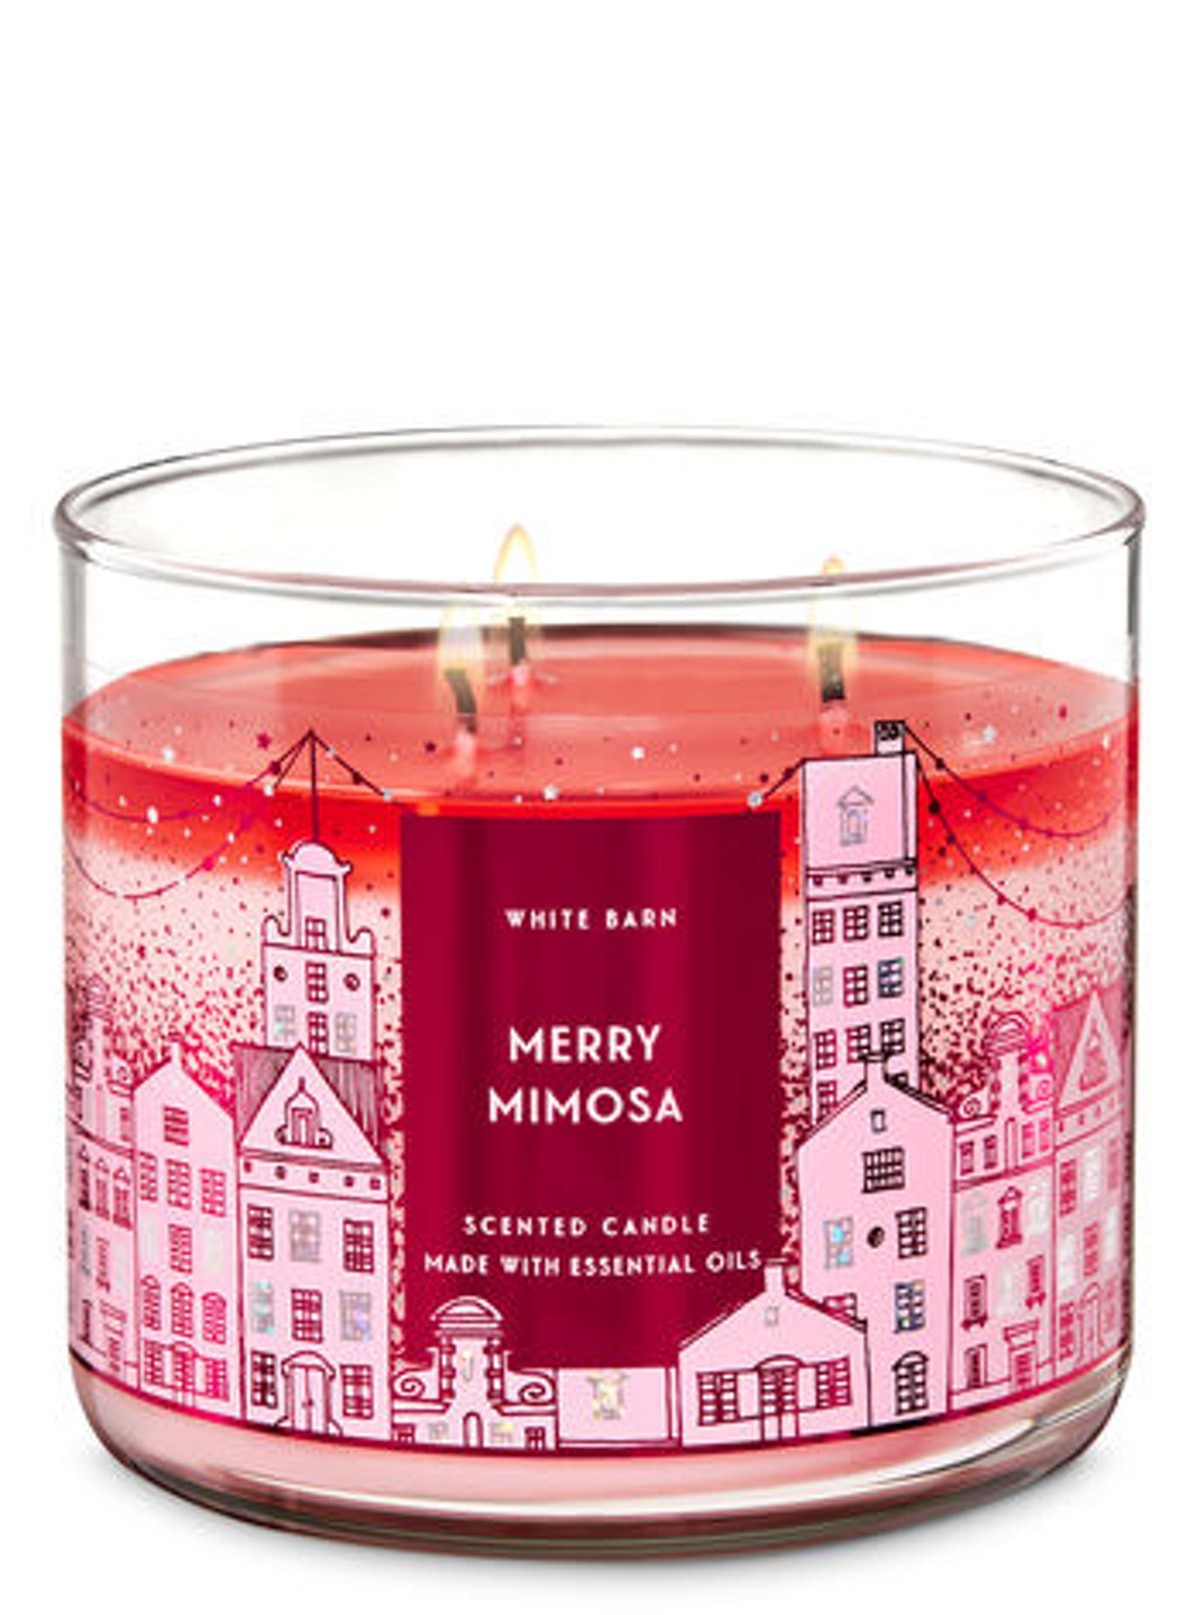 Merry Mimosa